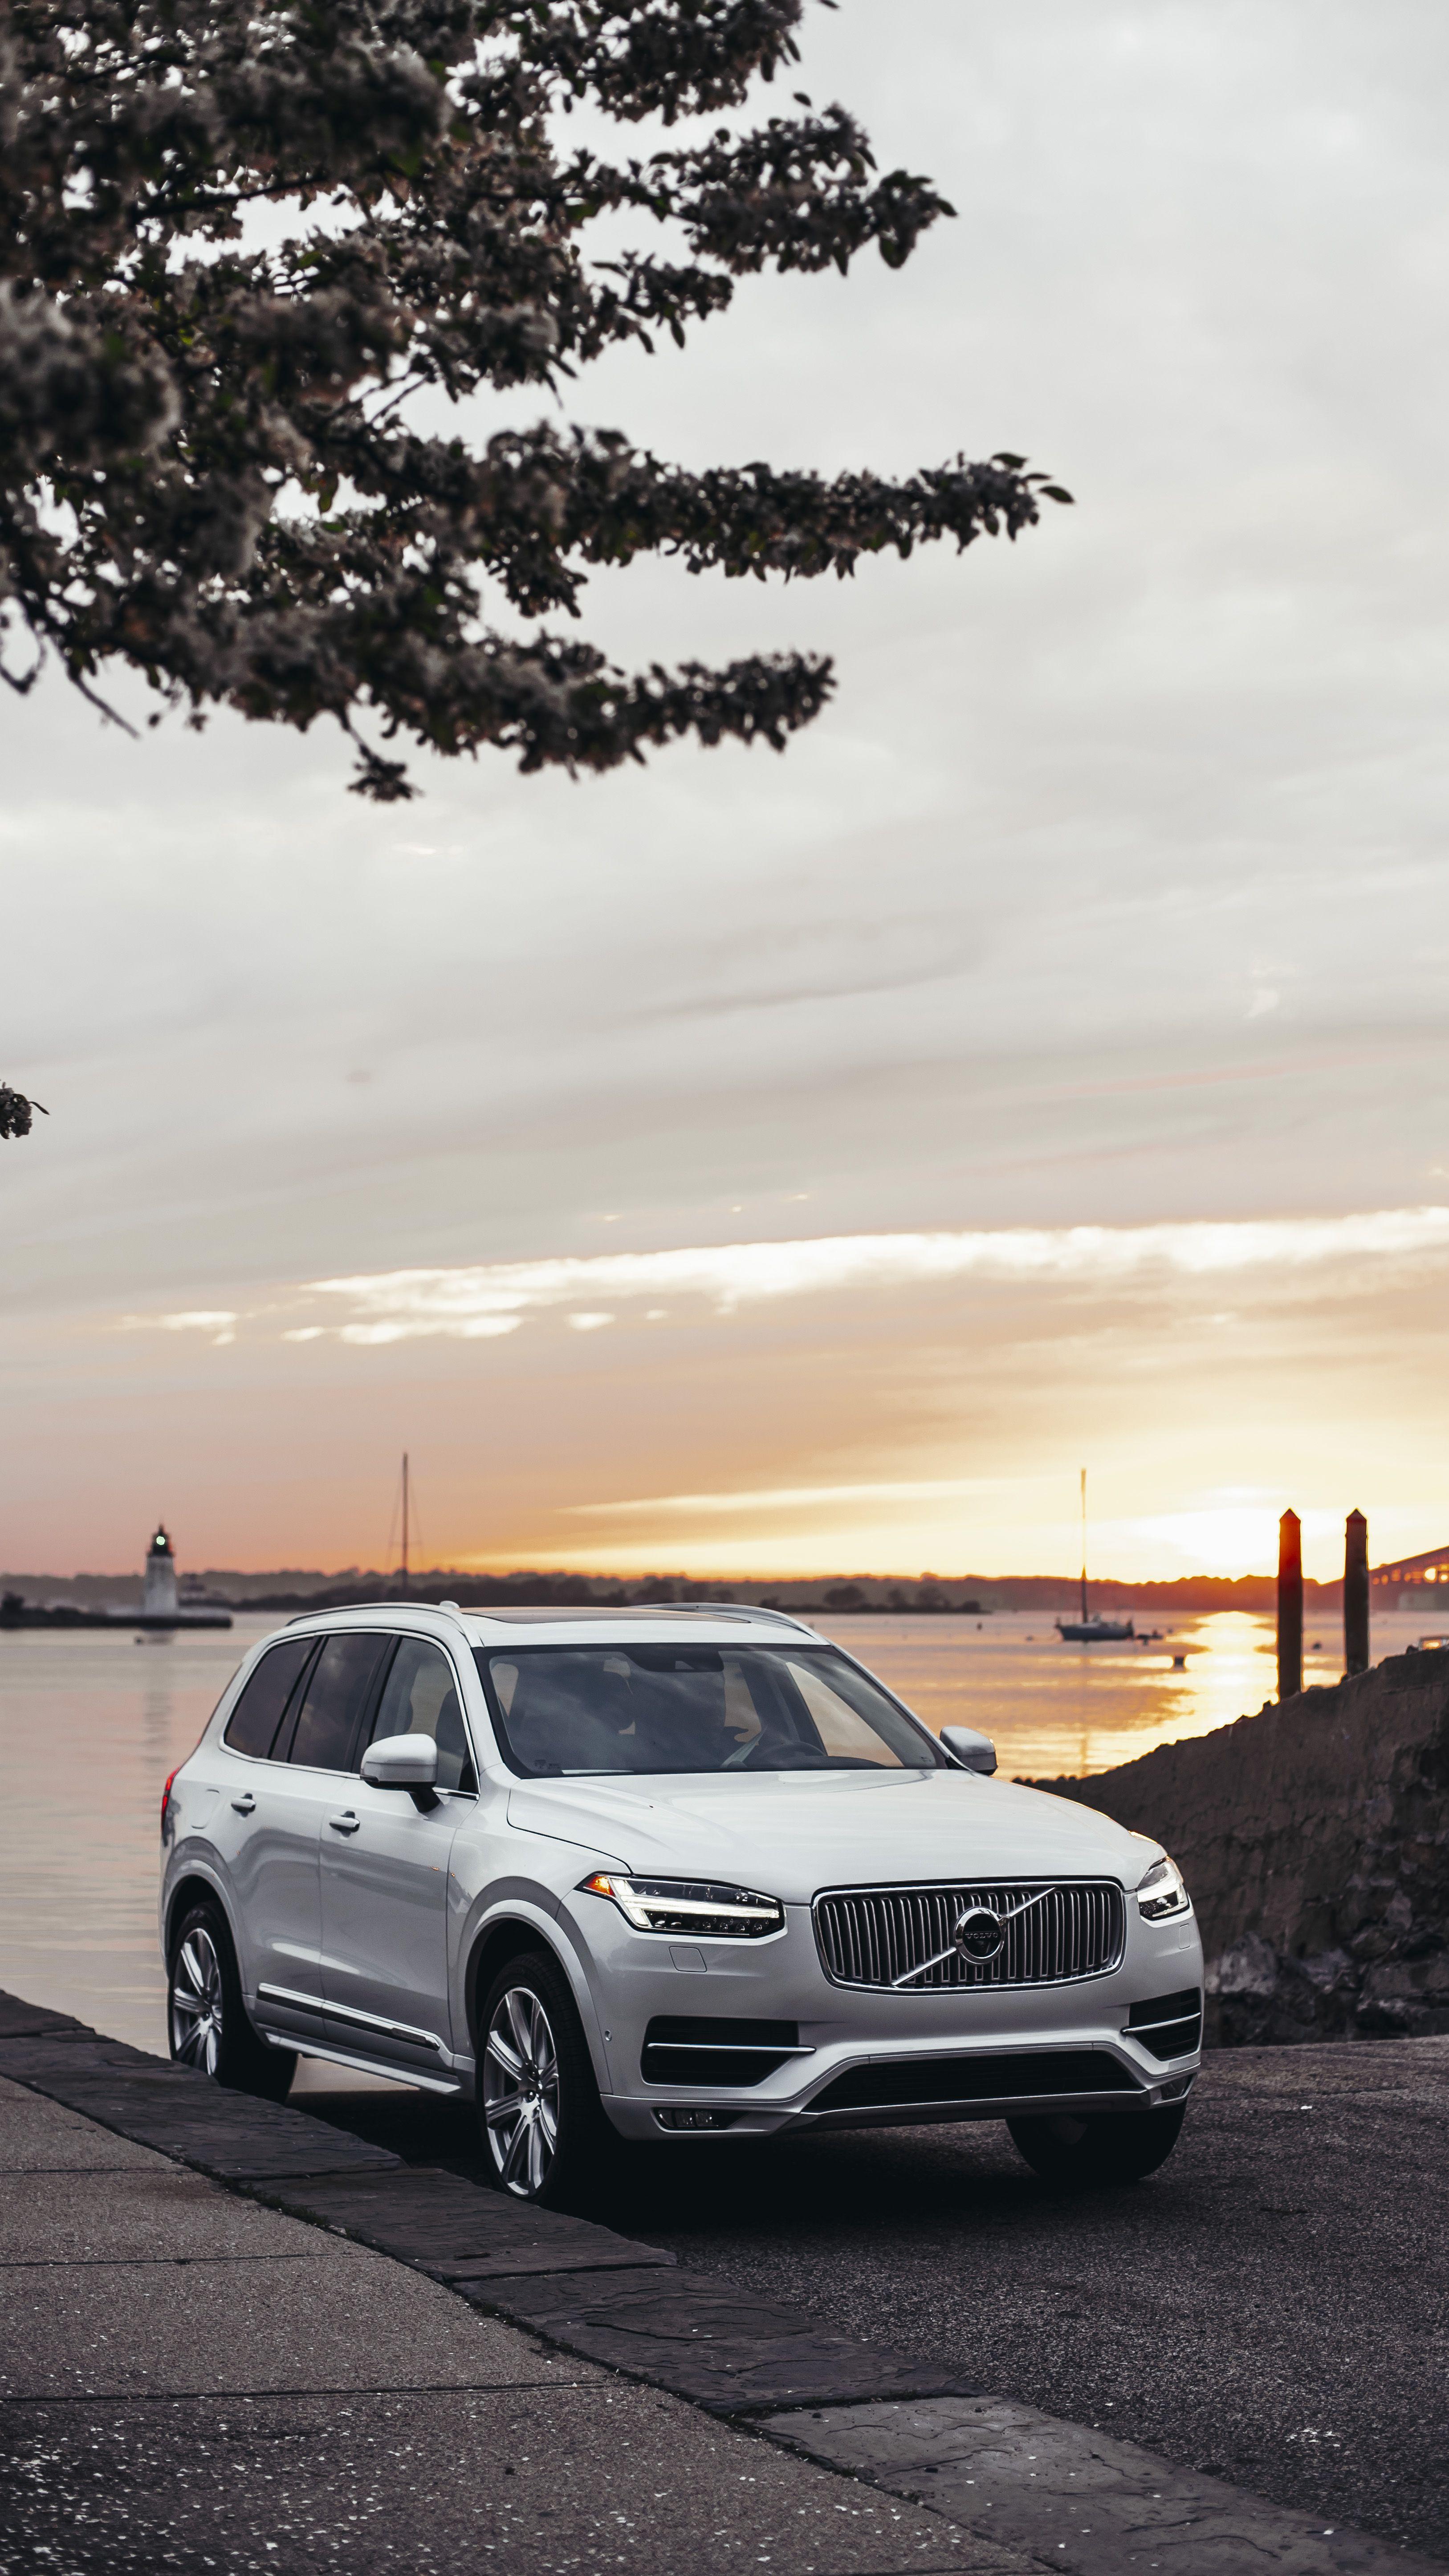 2018 Volvo Xc90 Luxury Suv Volvo Car Usa Volvo Cars Volvo